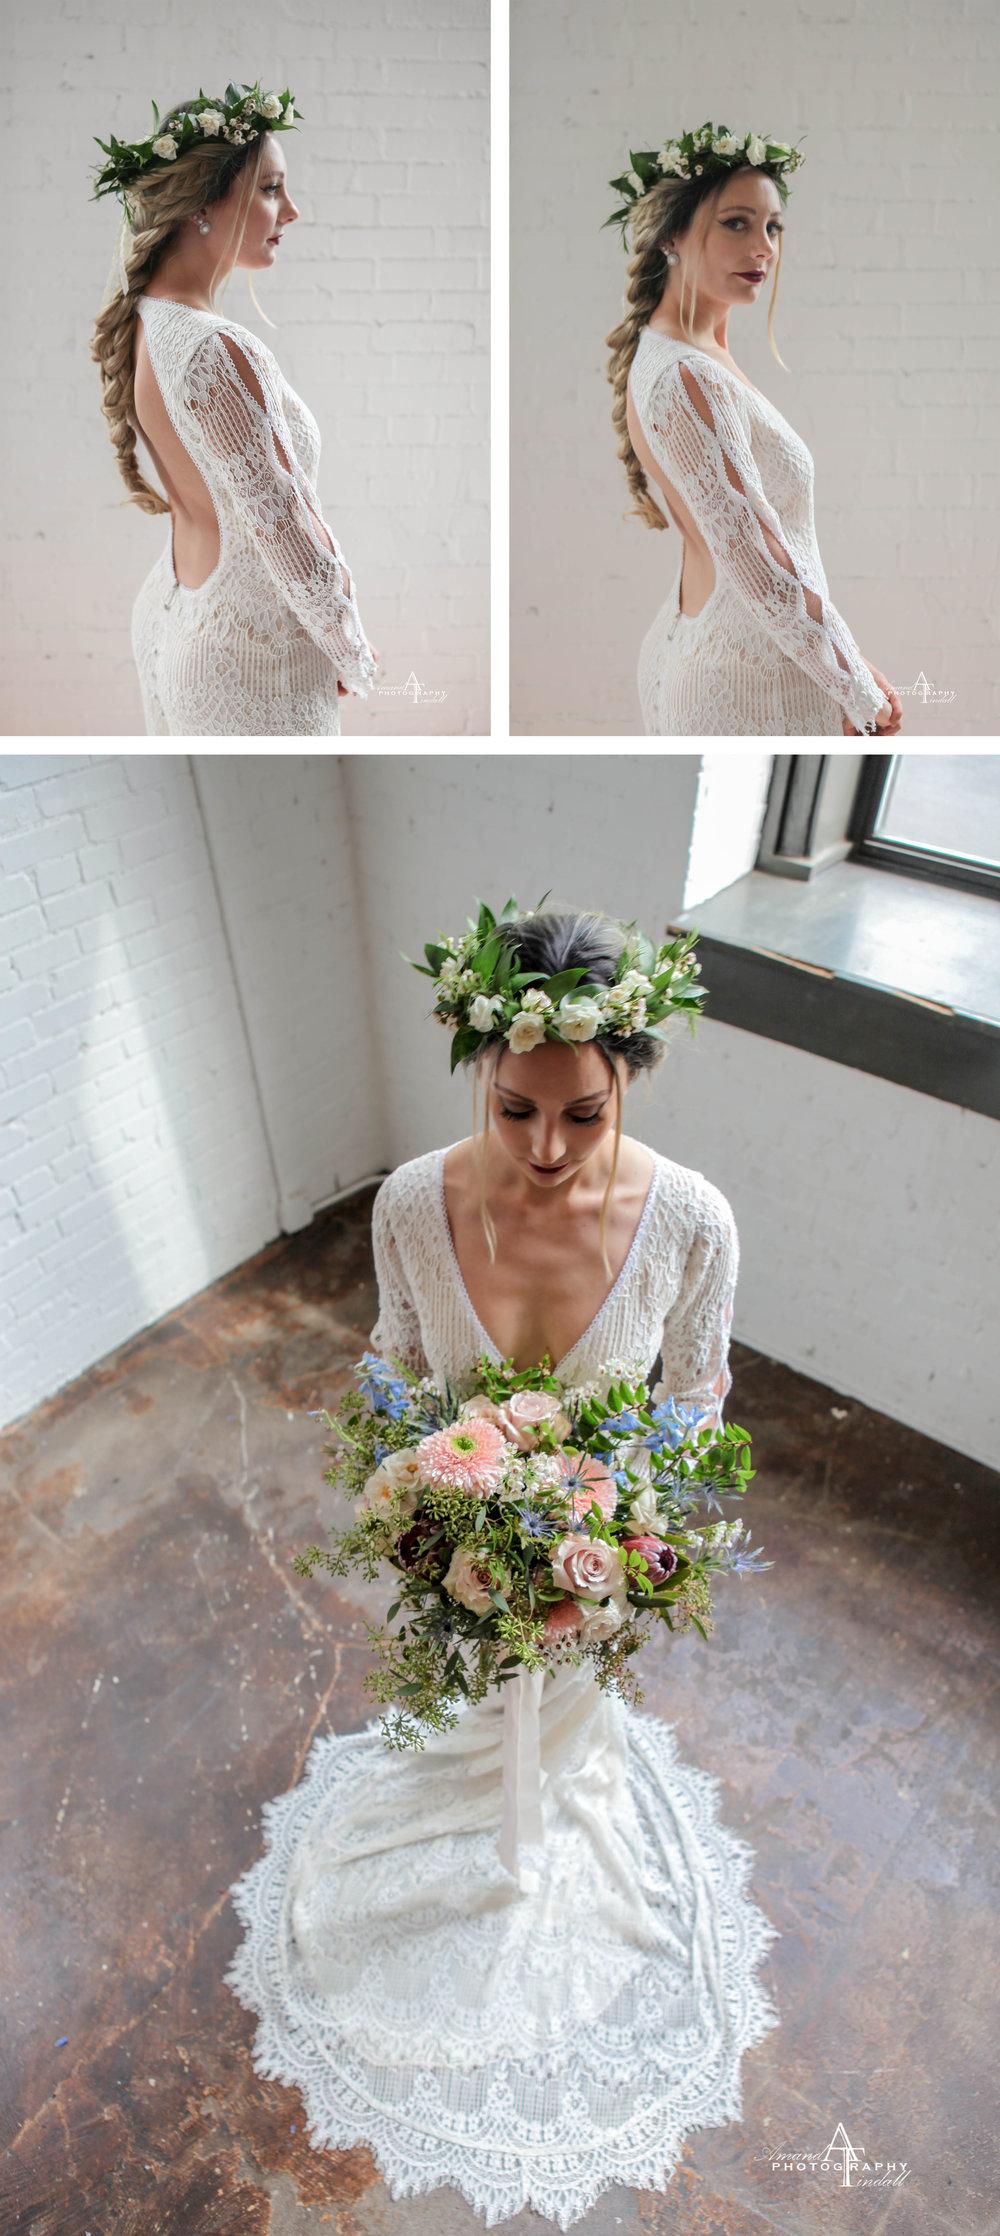 Blue Bicycle Weddings | Boho Meets Urban Chic | A Wedding ...